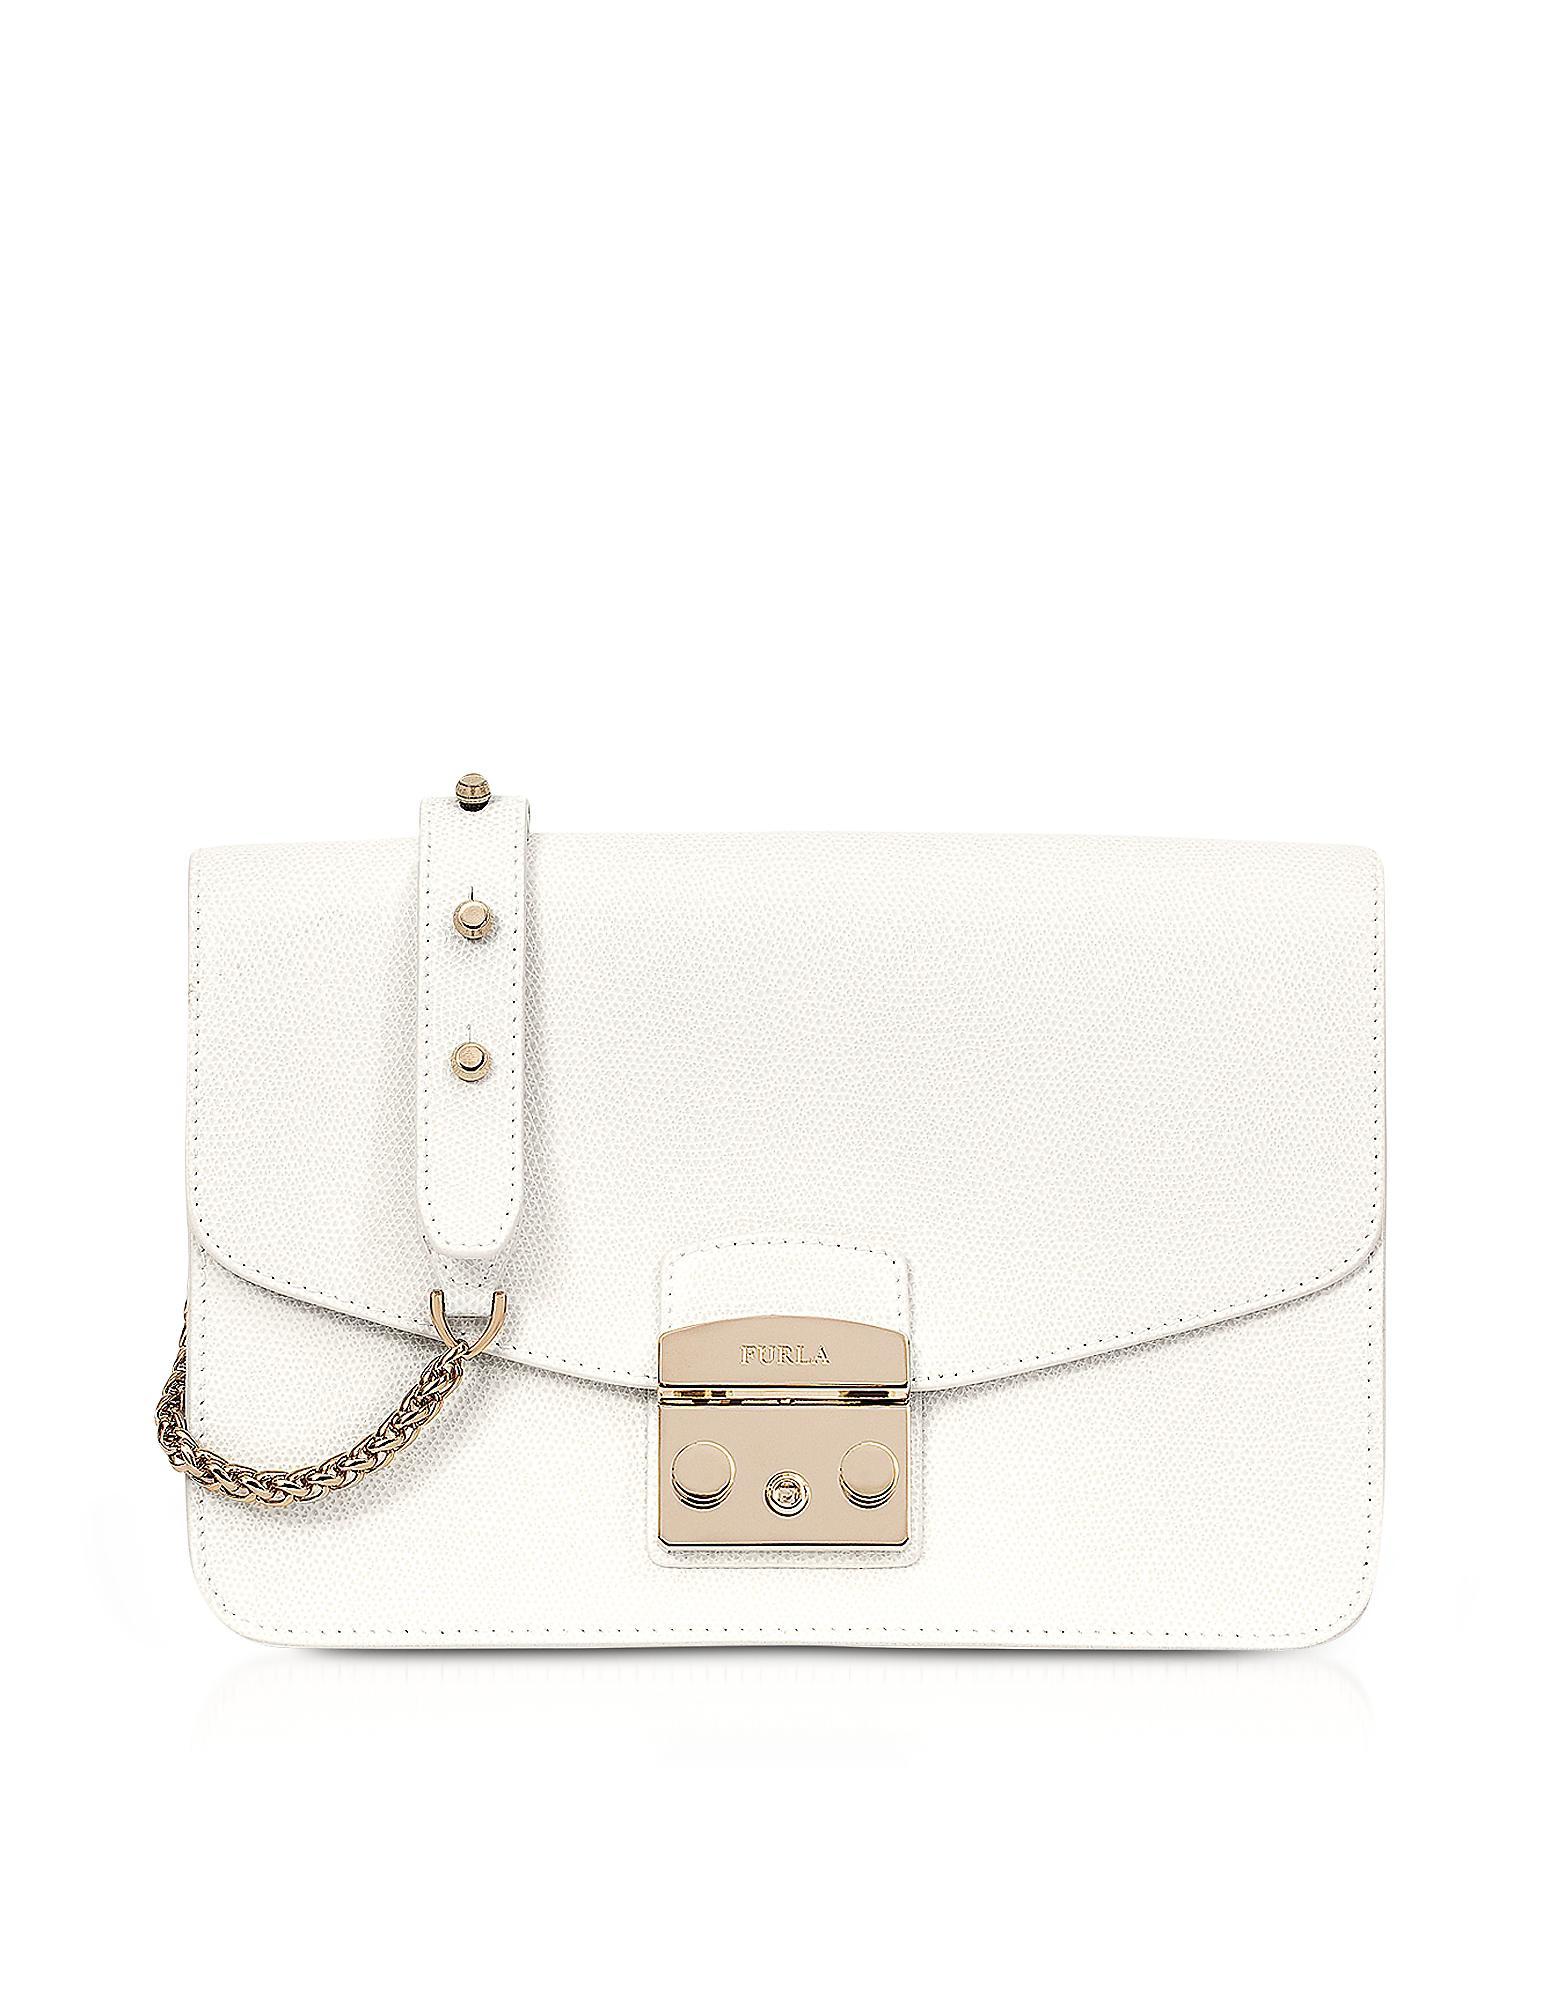 e1c03ae983 Lyst - Furla Petalo Metropolis Small Leather Shoulder Bag in White